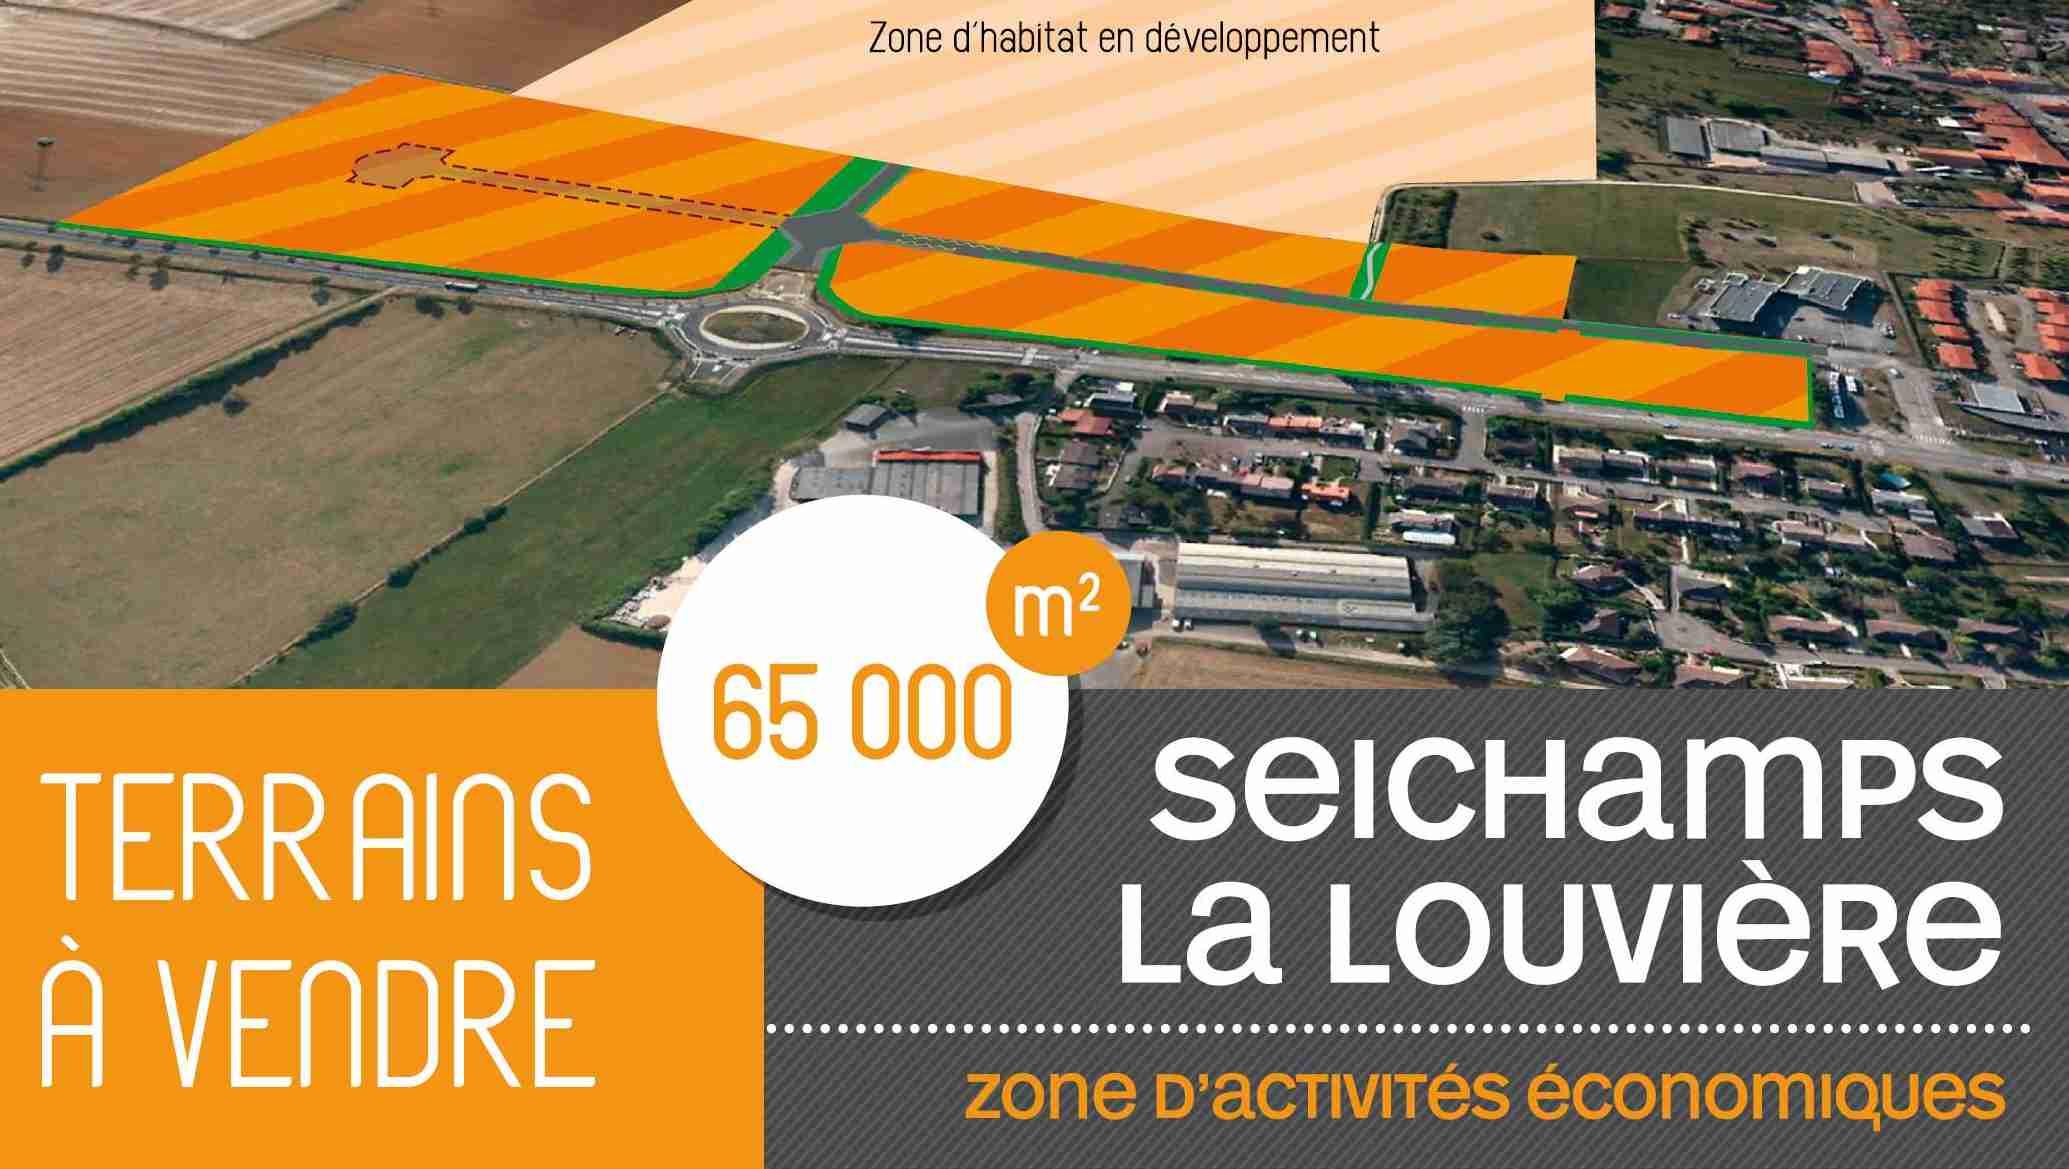 SEICHAMPS - ZAC DE LA LOUVIERE